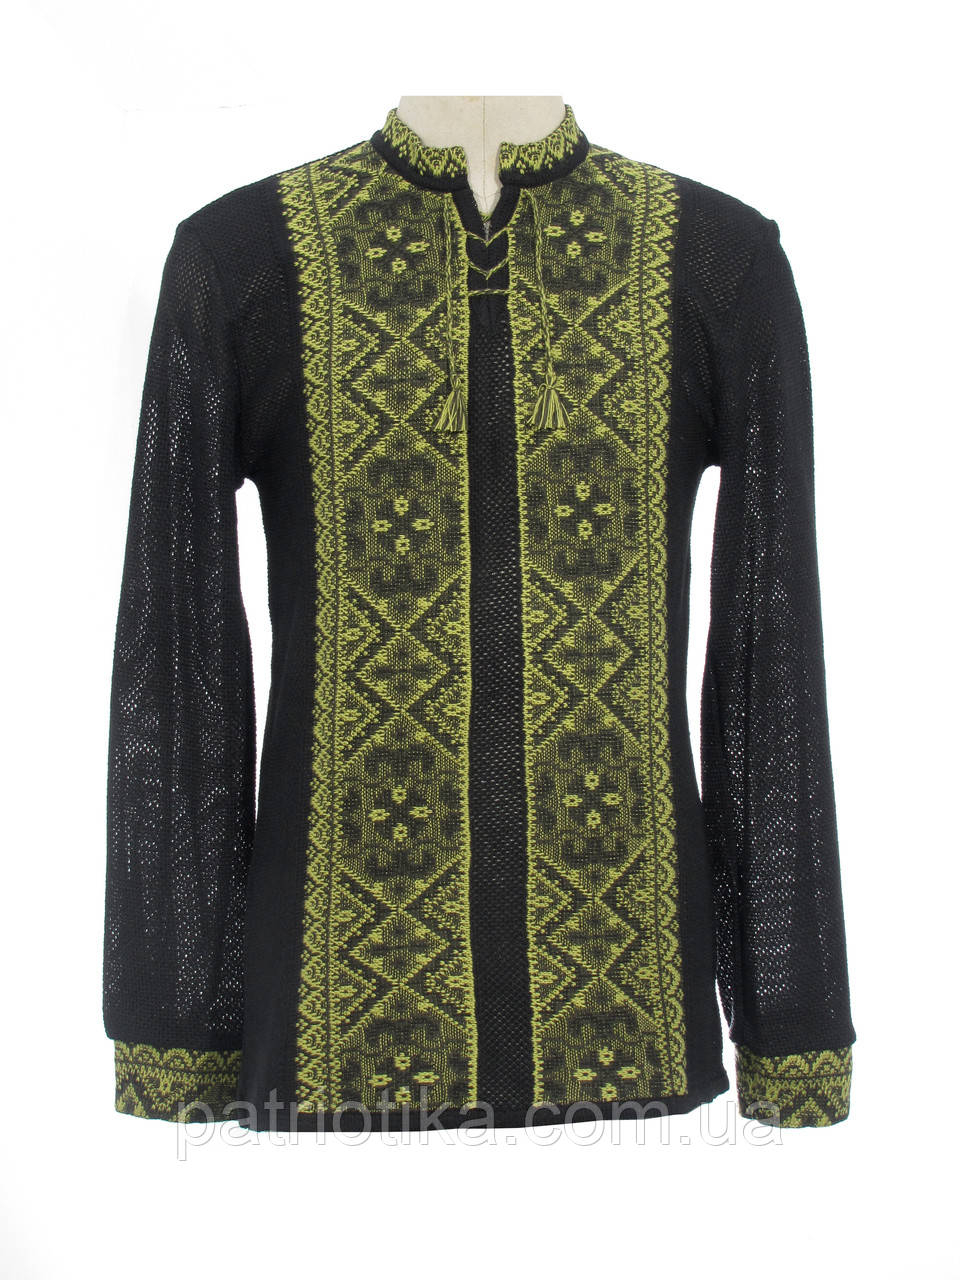 Мужская вязаная черная рубашка Влад зеленый х/б   Чоловіча в'язана сорочка Влад зелений х/б